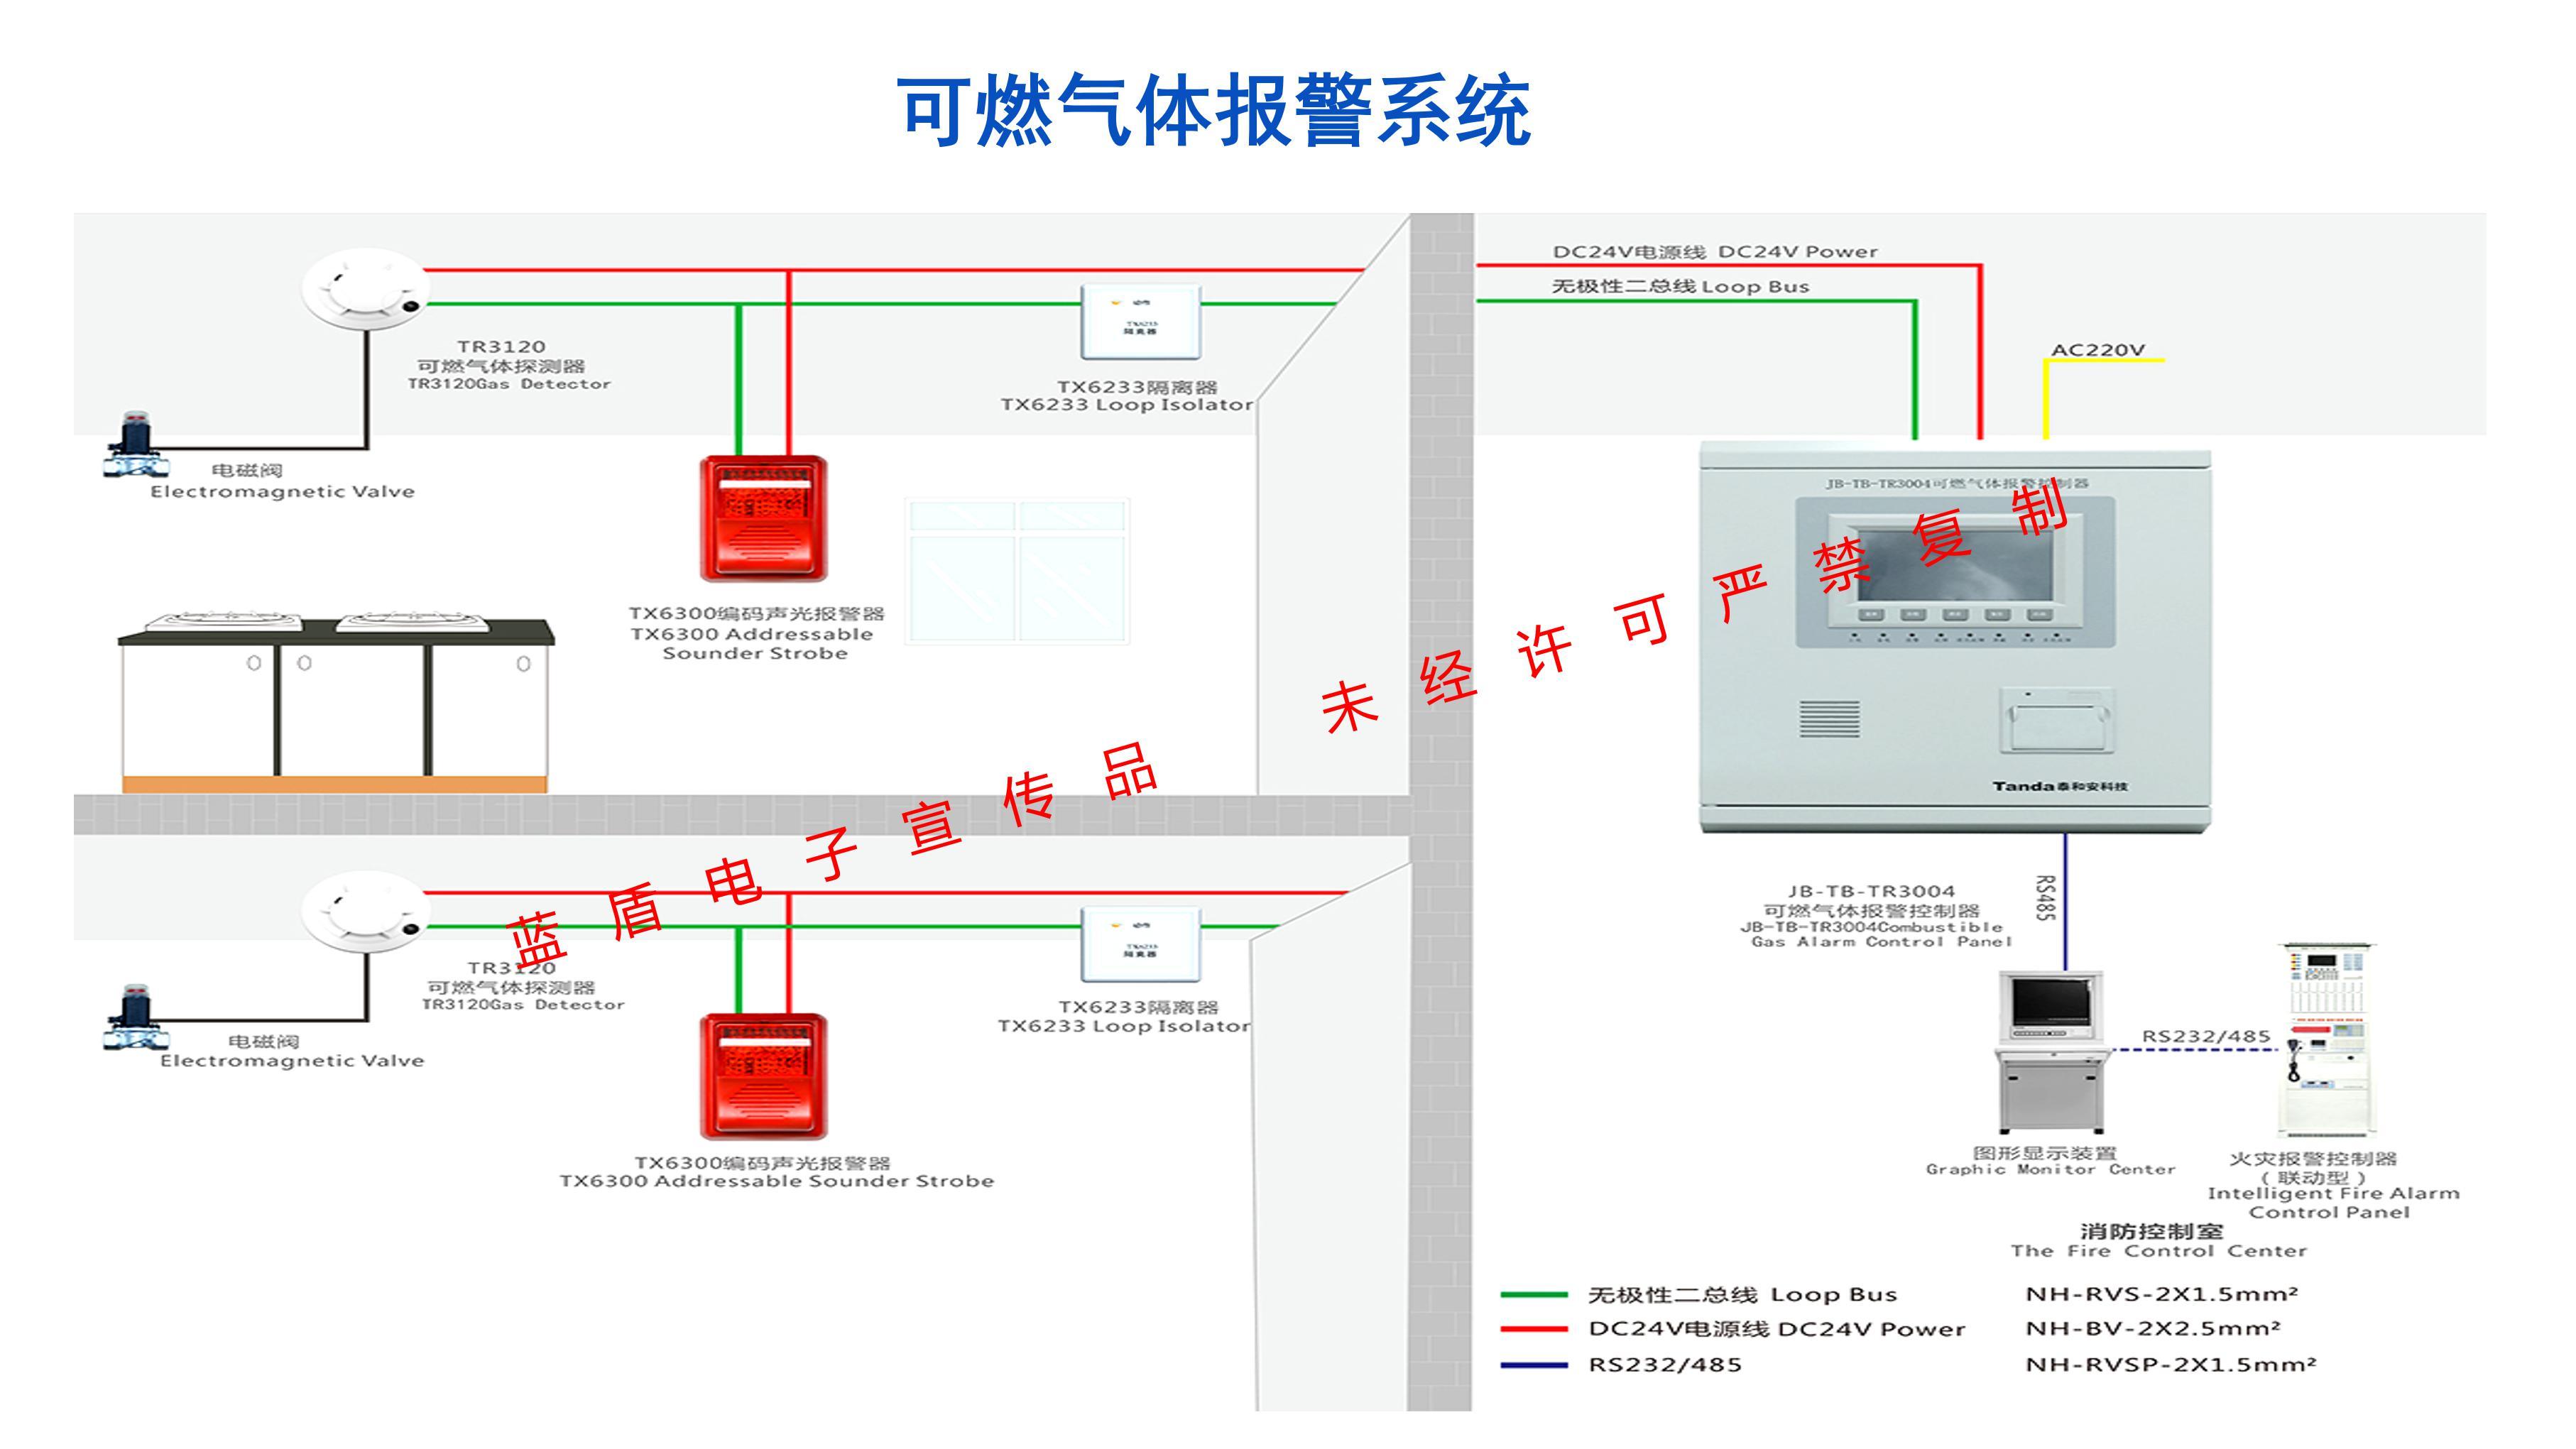 betway体育官网下载设施工程文案_08.jpg